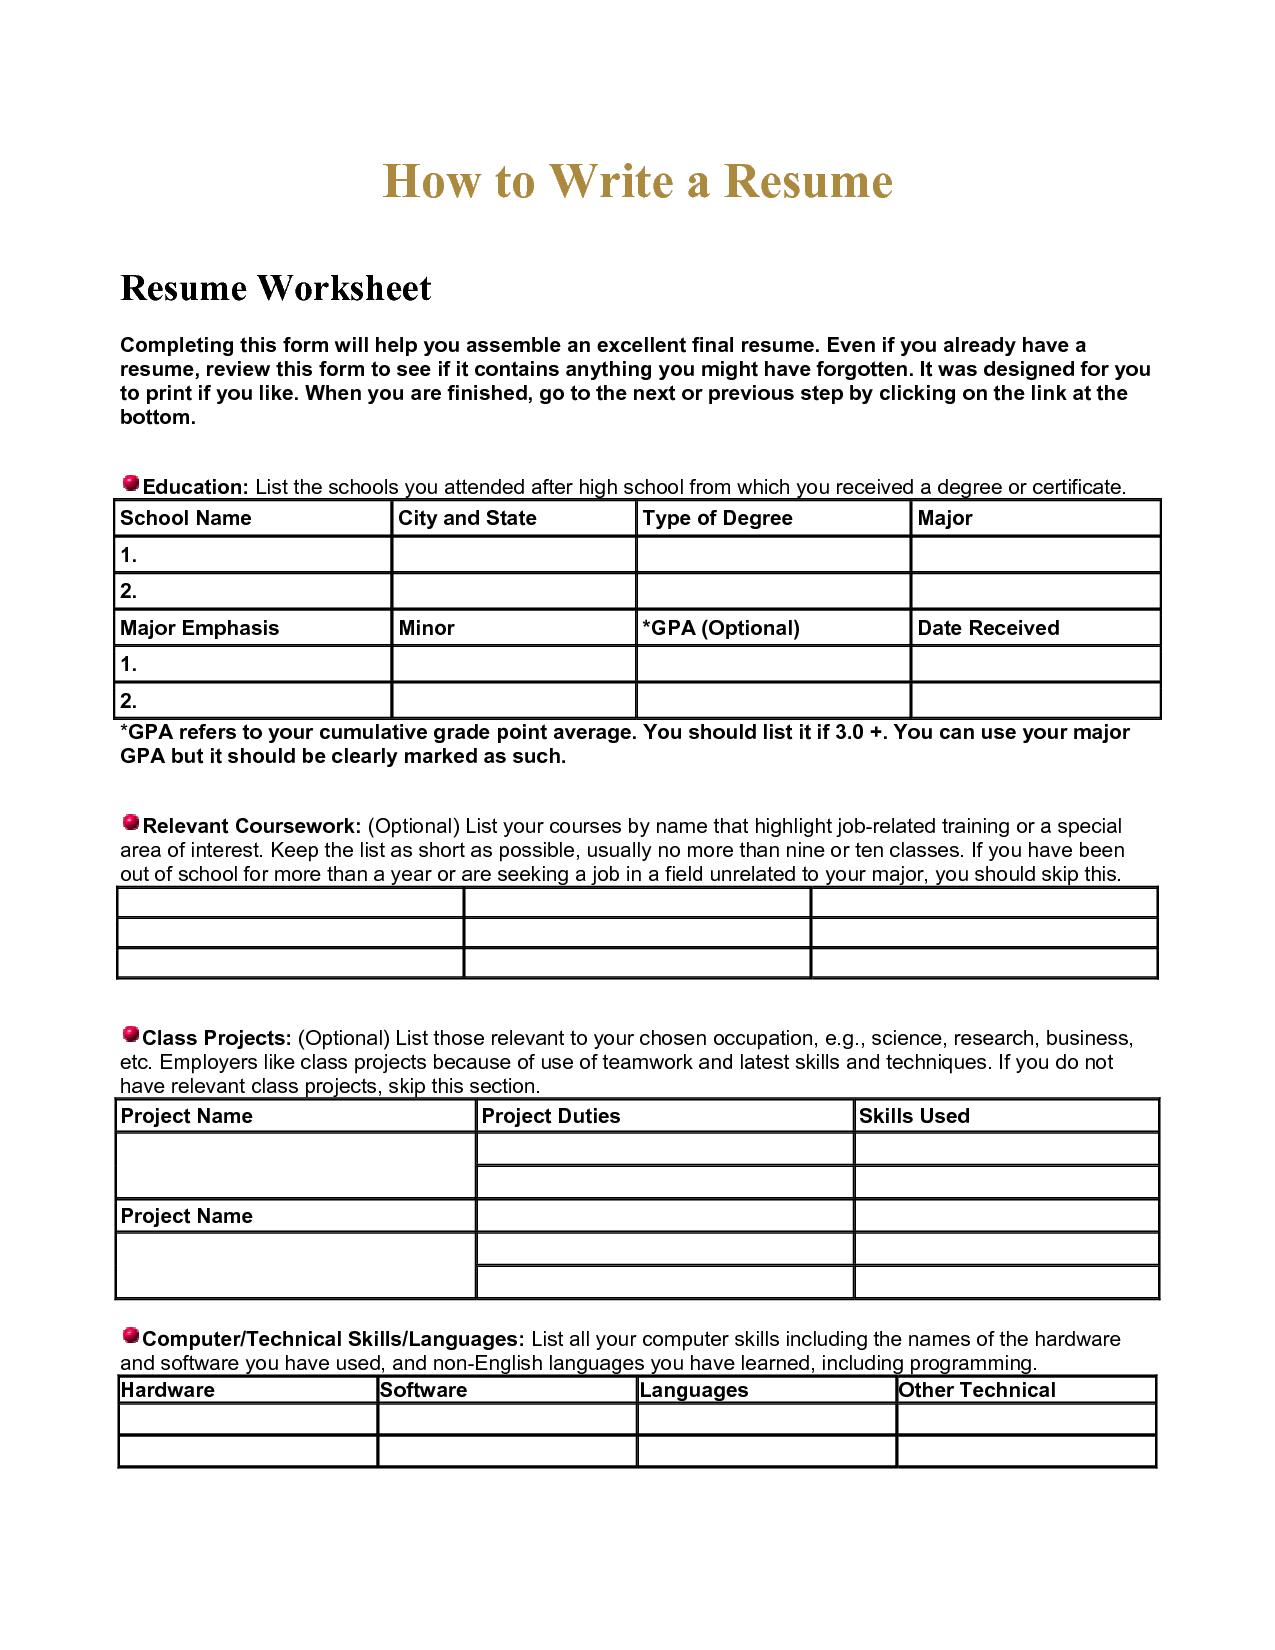 Fresh Ideas Resume Worksheet For High School Students High School